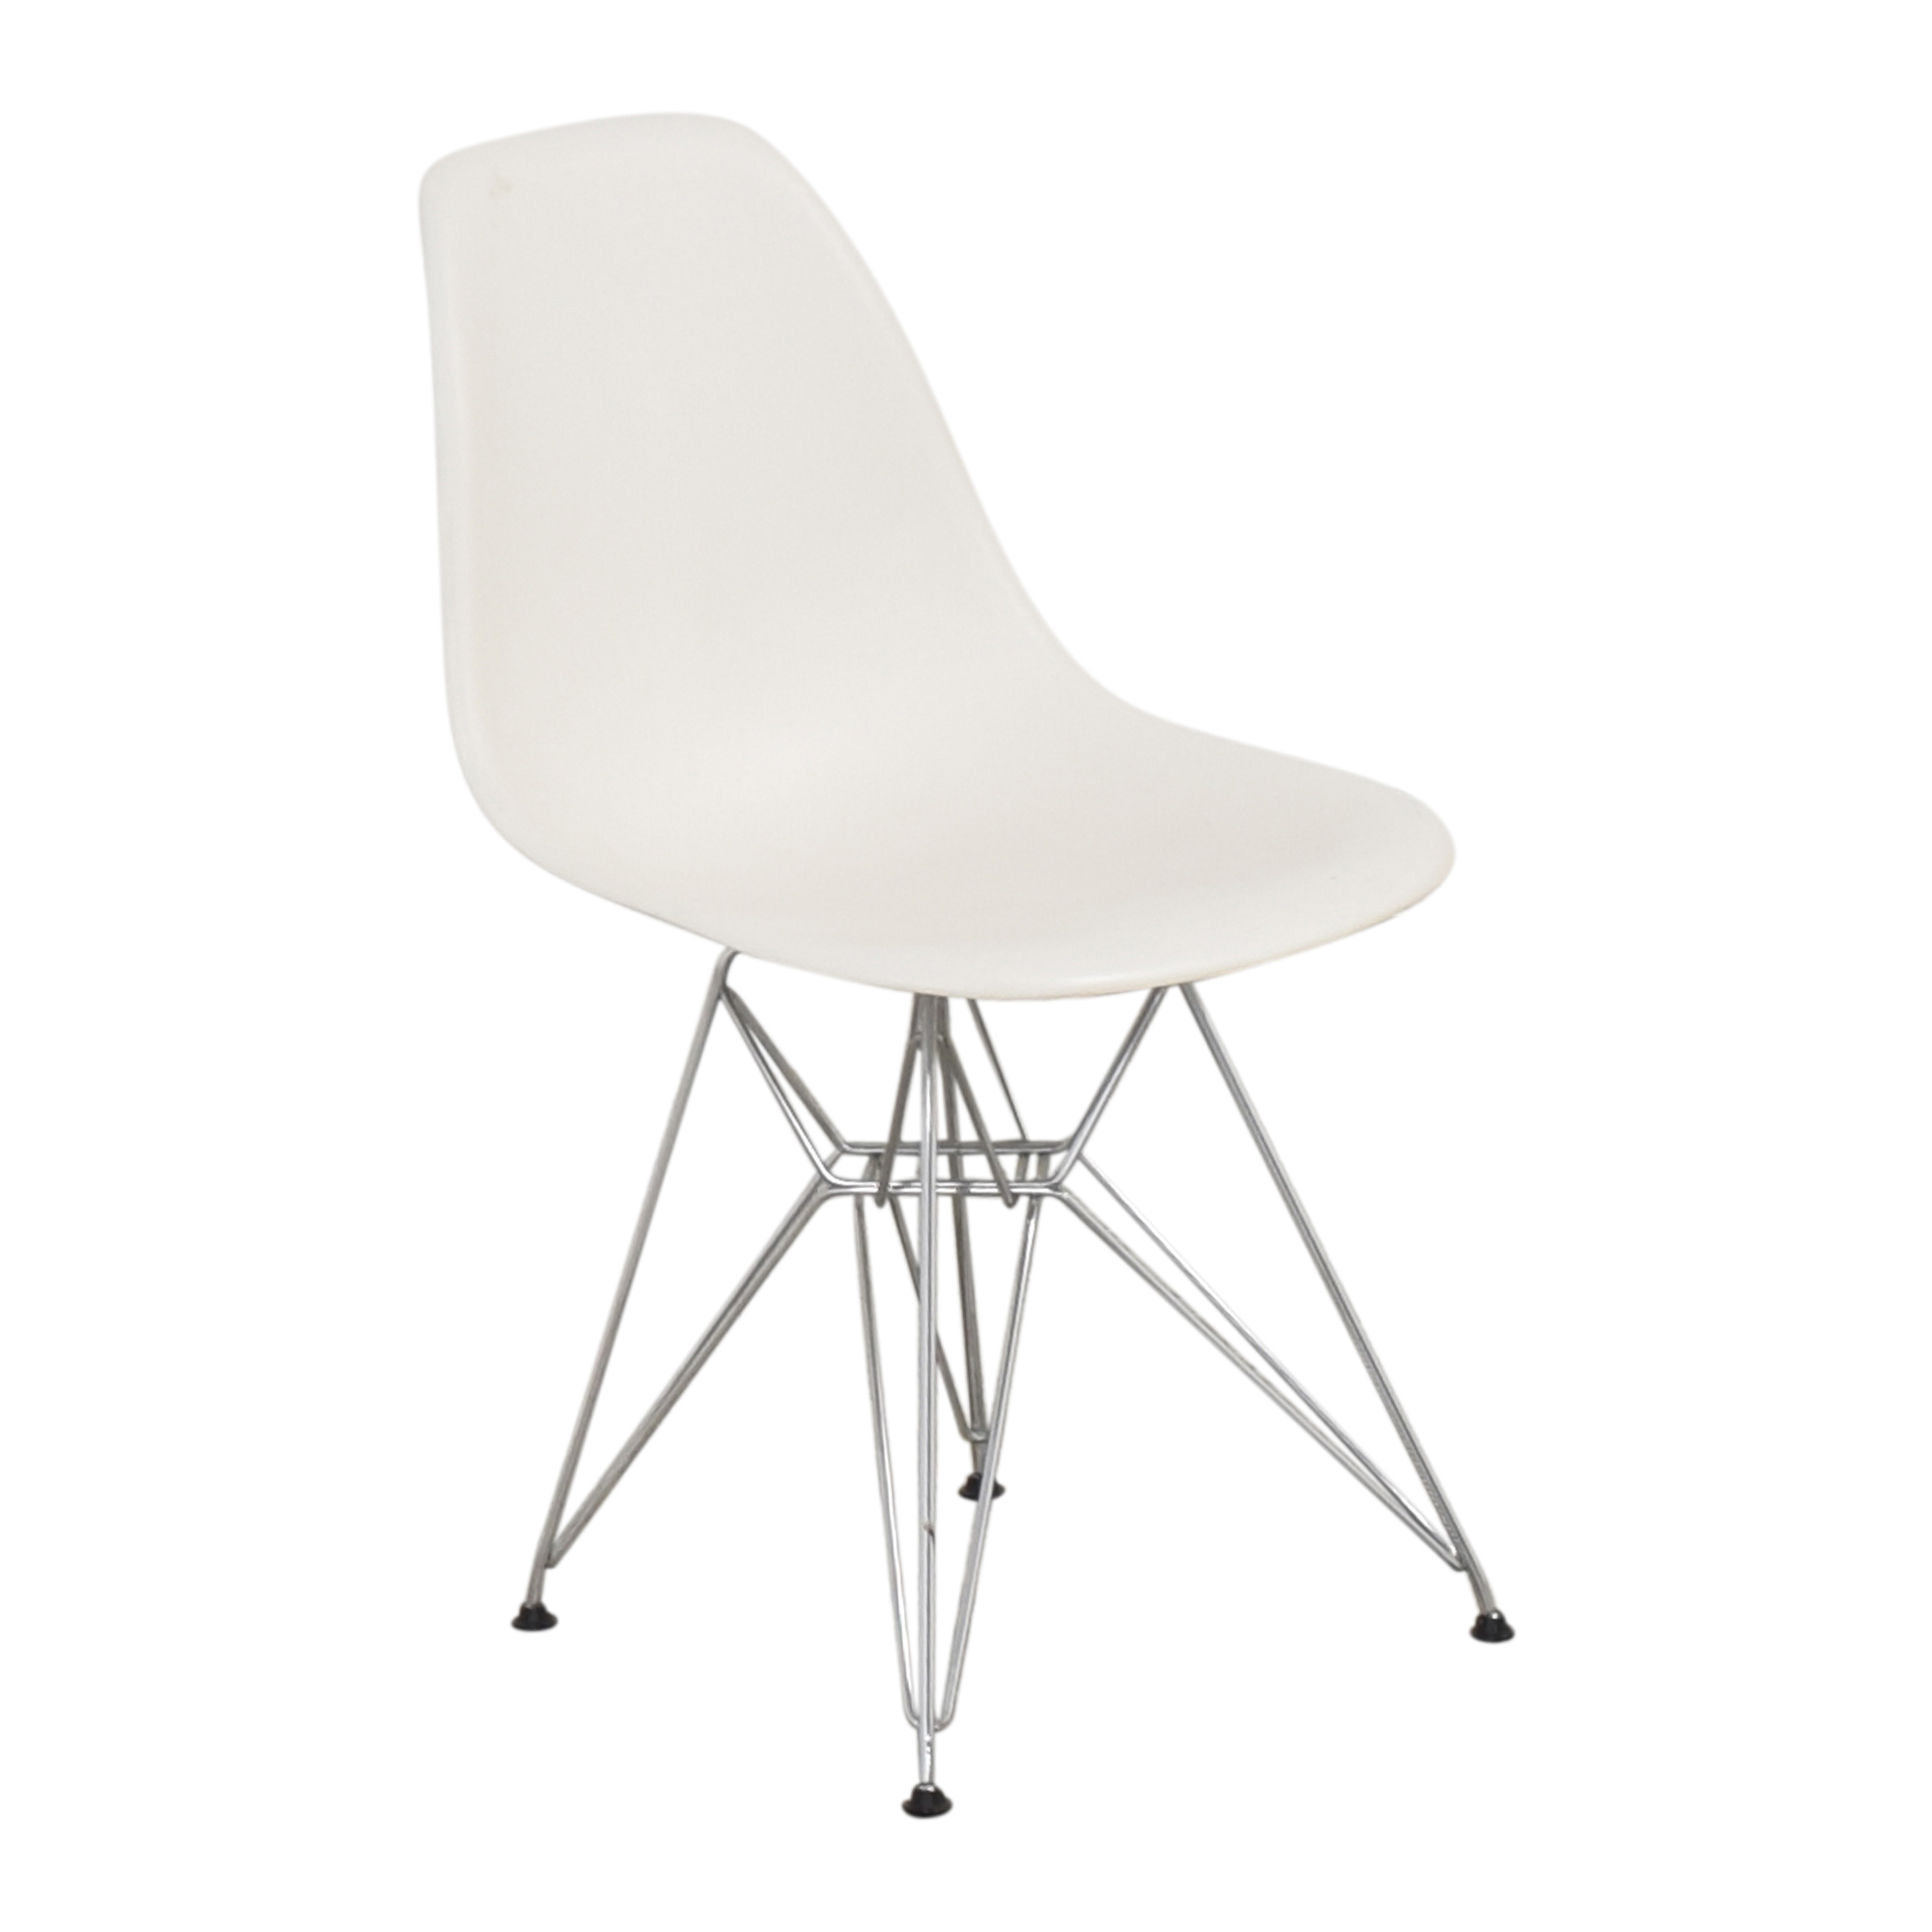 buy Herman Miller Herman Miller Eames Molded Side Chair online